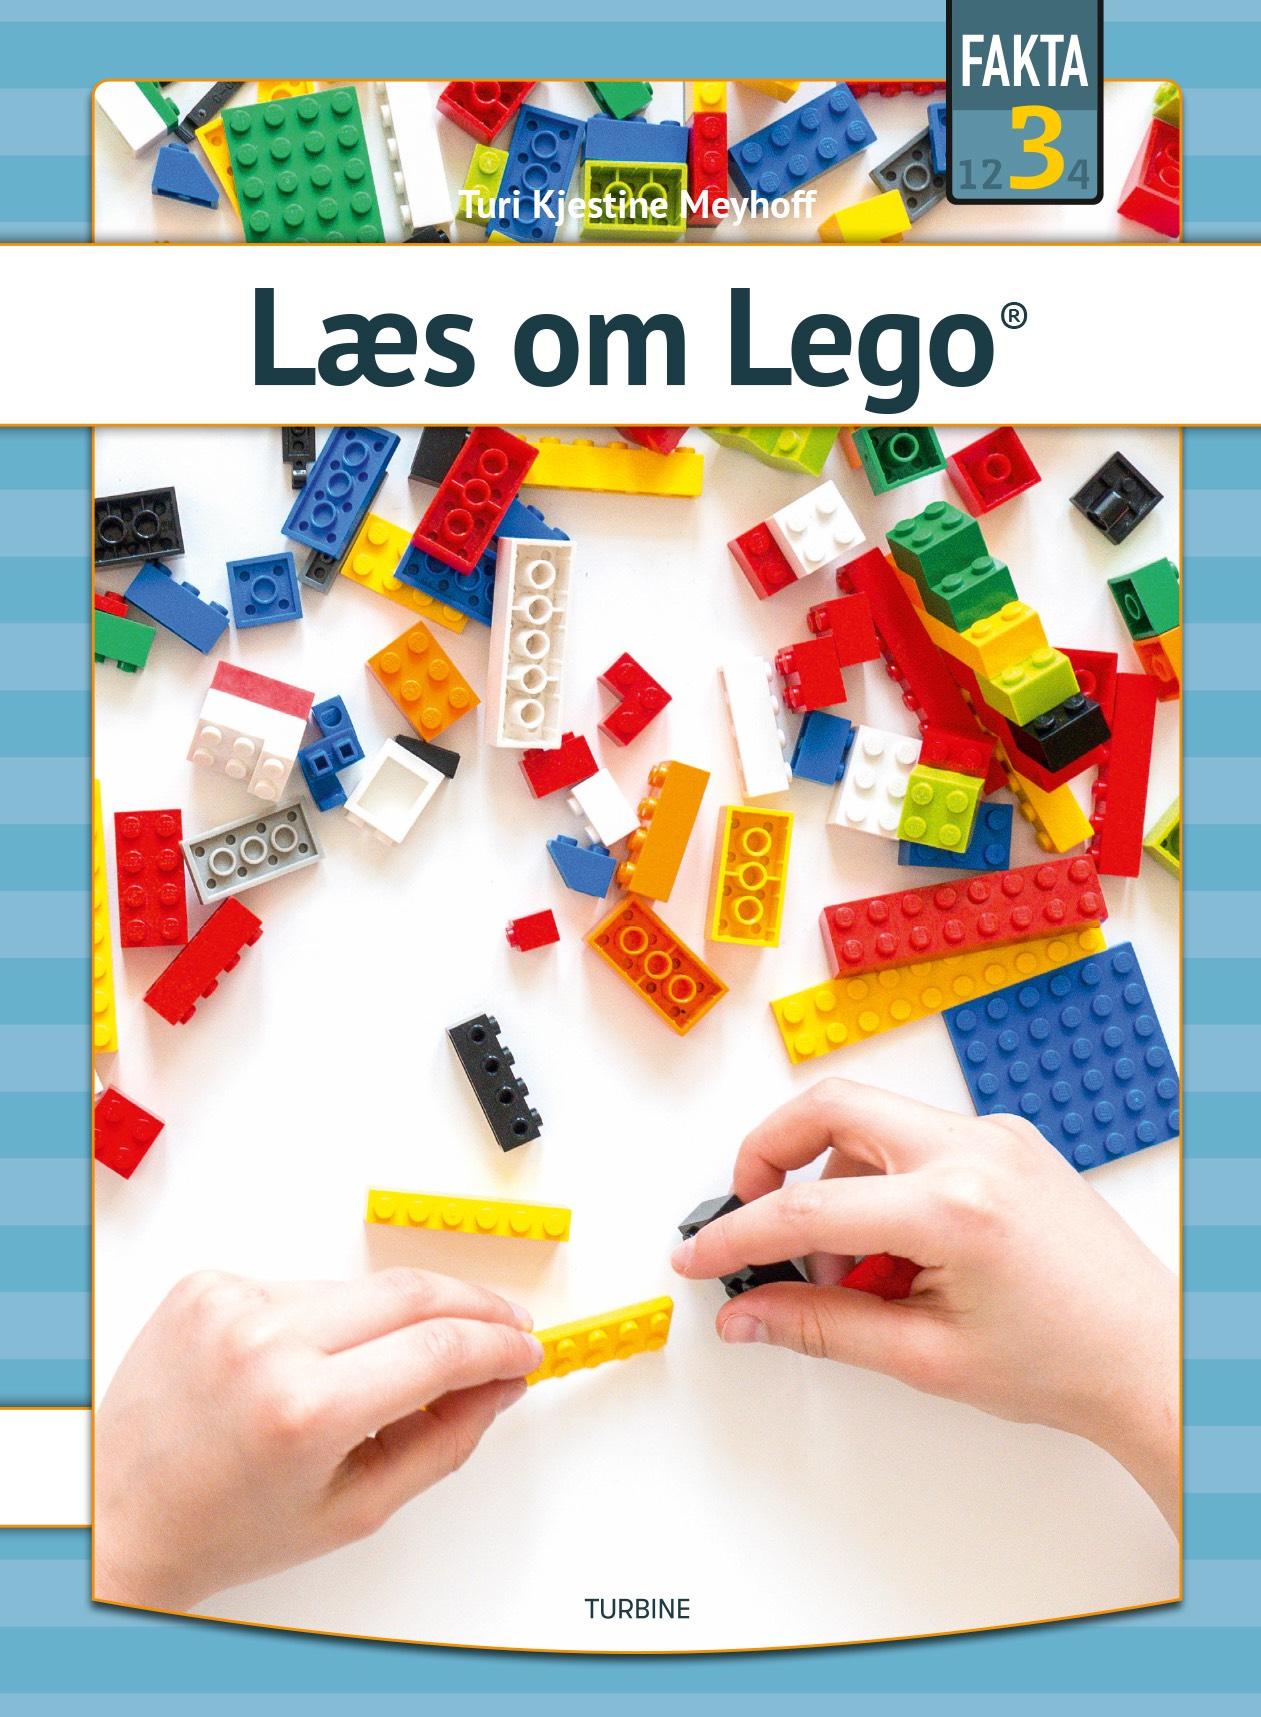 Fakta 3: Lego - Turi Kjestine Meyhoff - Bøger - Turbine - 9788740662993 - 12/8-2020